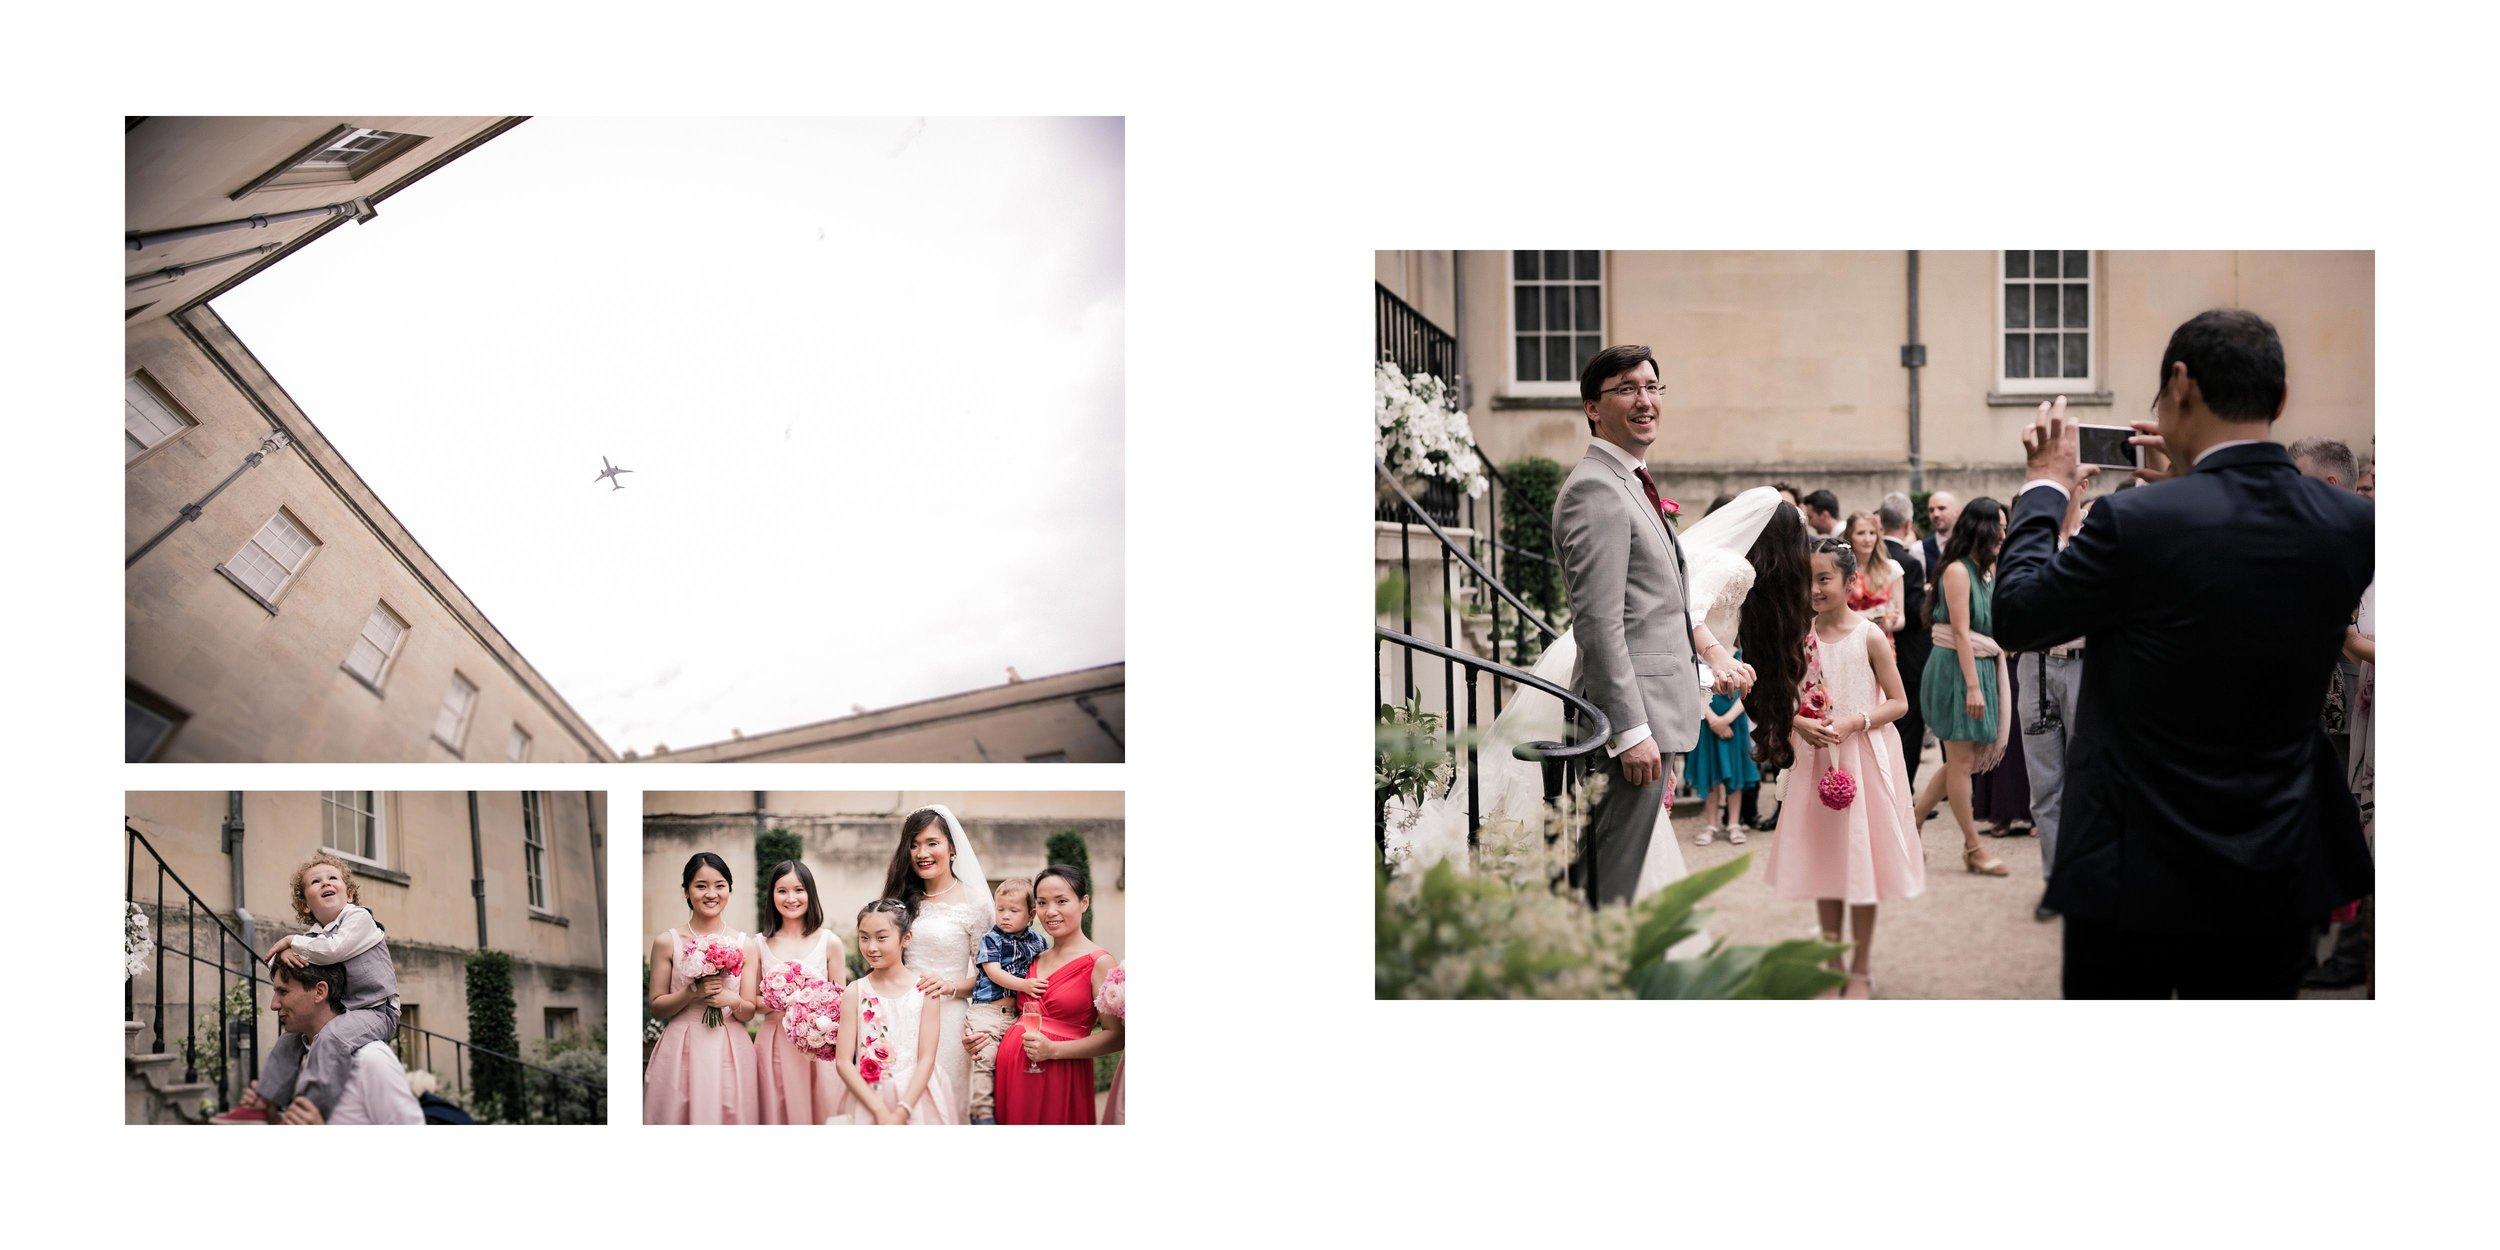 wedding_photographer_surrey_39.jpg